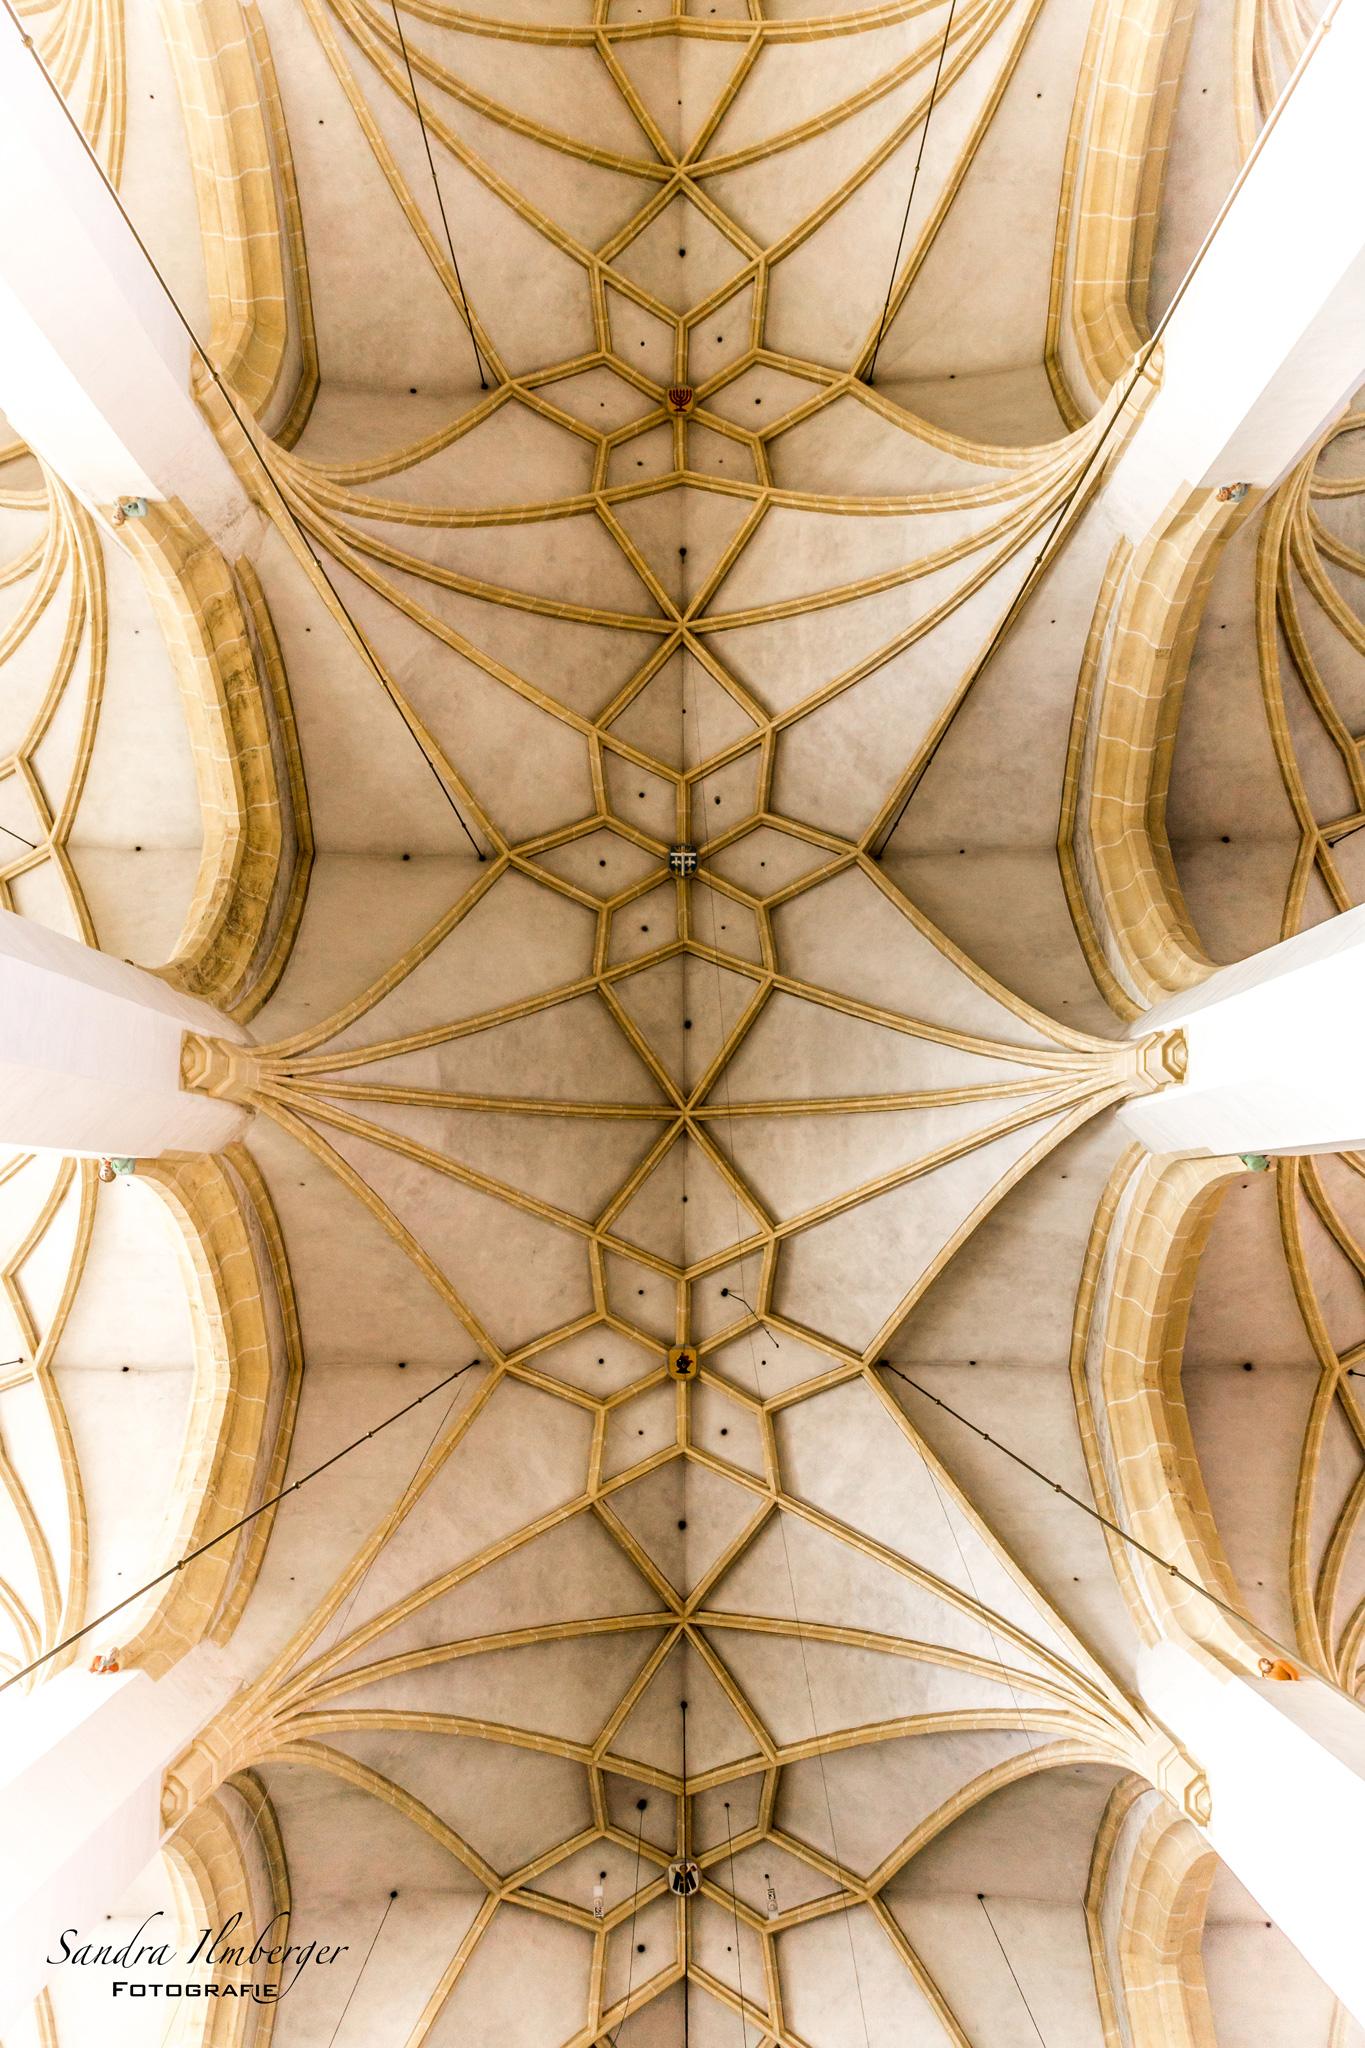 Dome (Foto: Sandra Ilmberger)